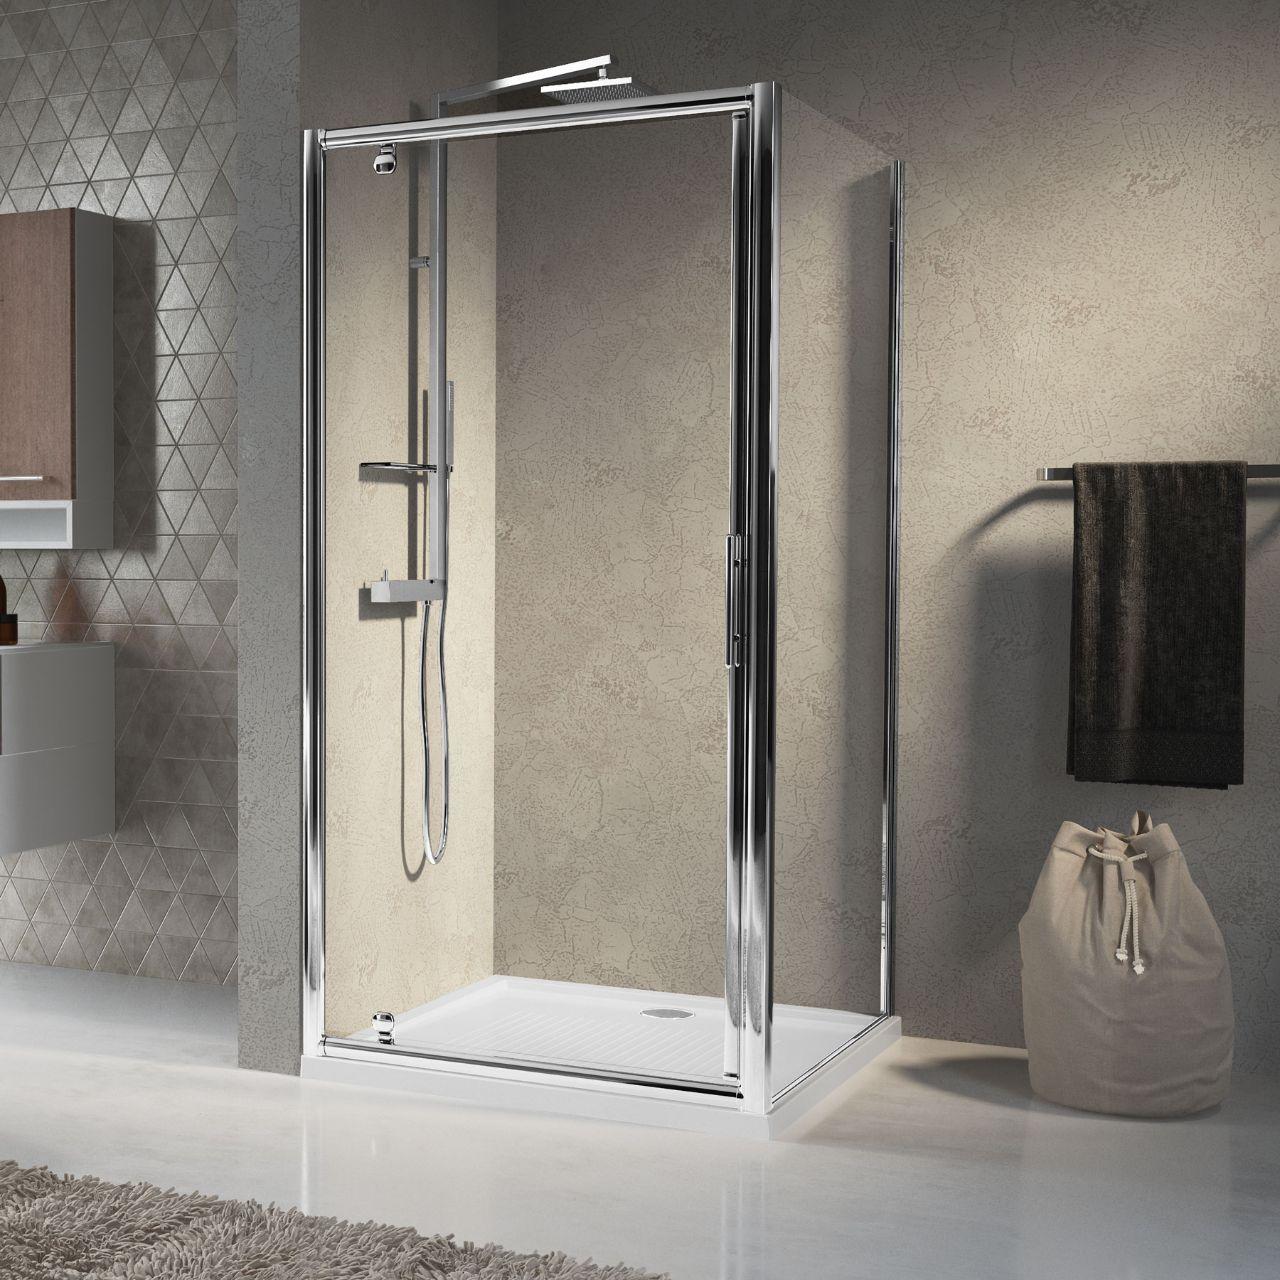 Shower enclosures lunes g novellini - Box doccia pentagonale ...